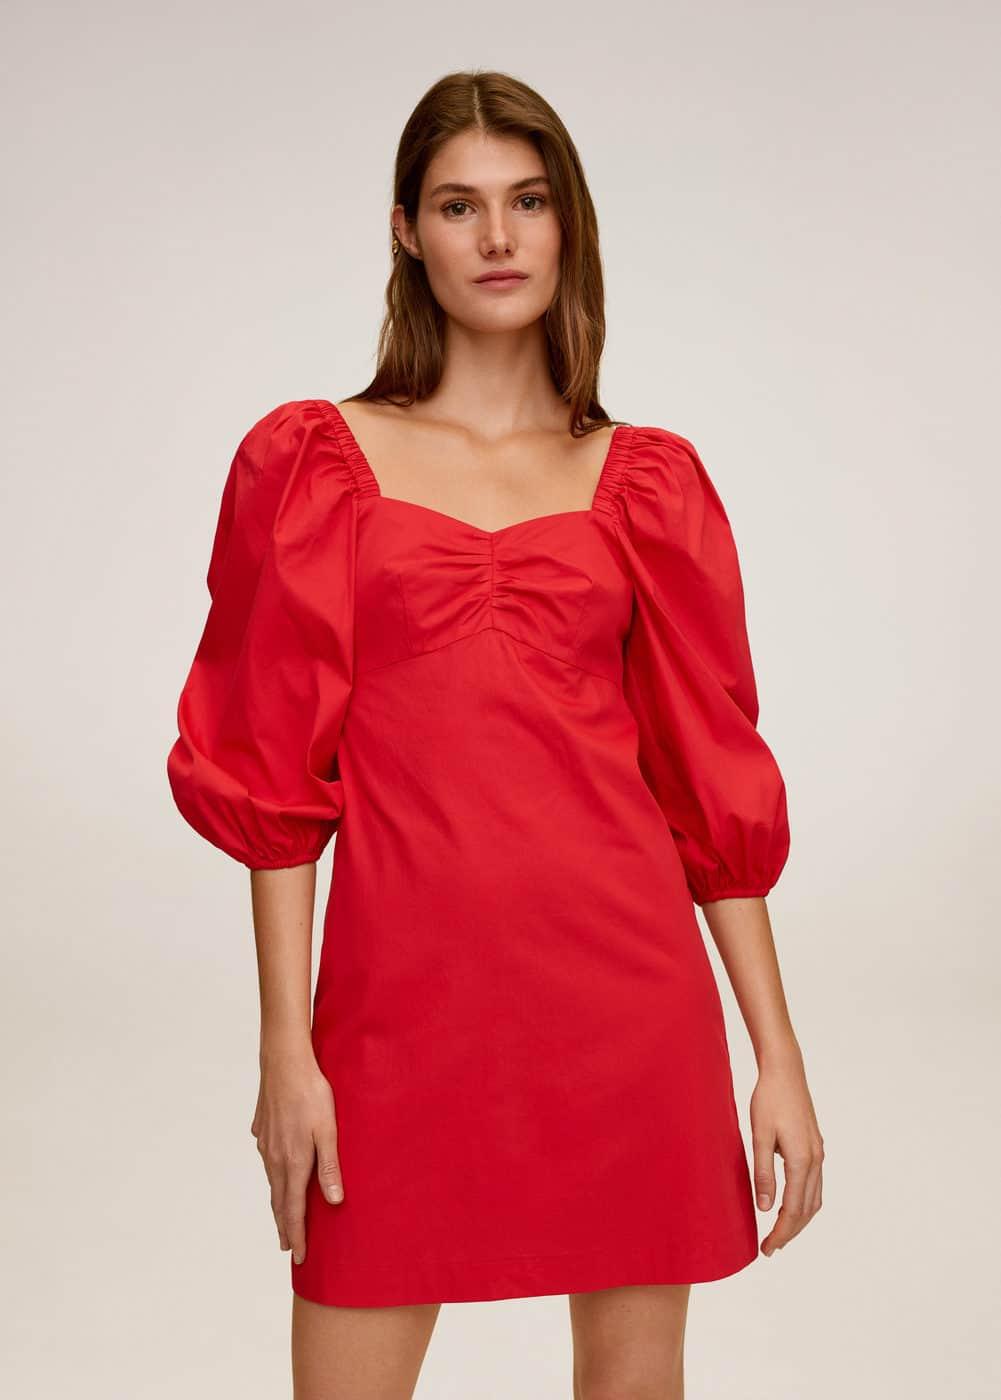 m-sleeve:vestido off-shoulder popelin